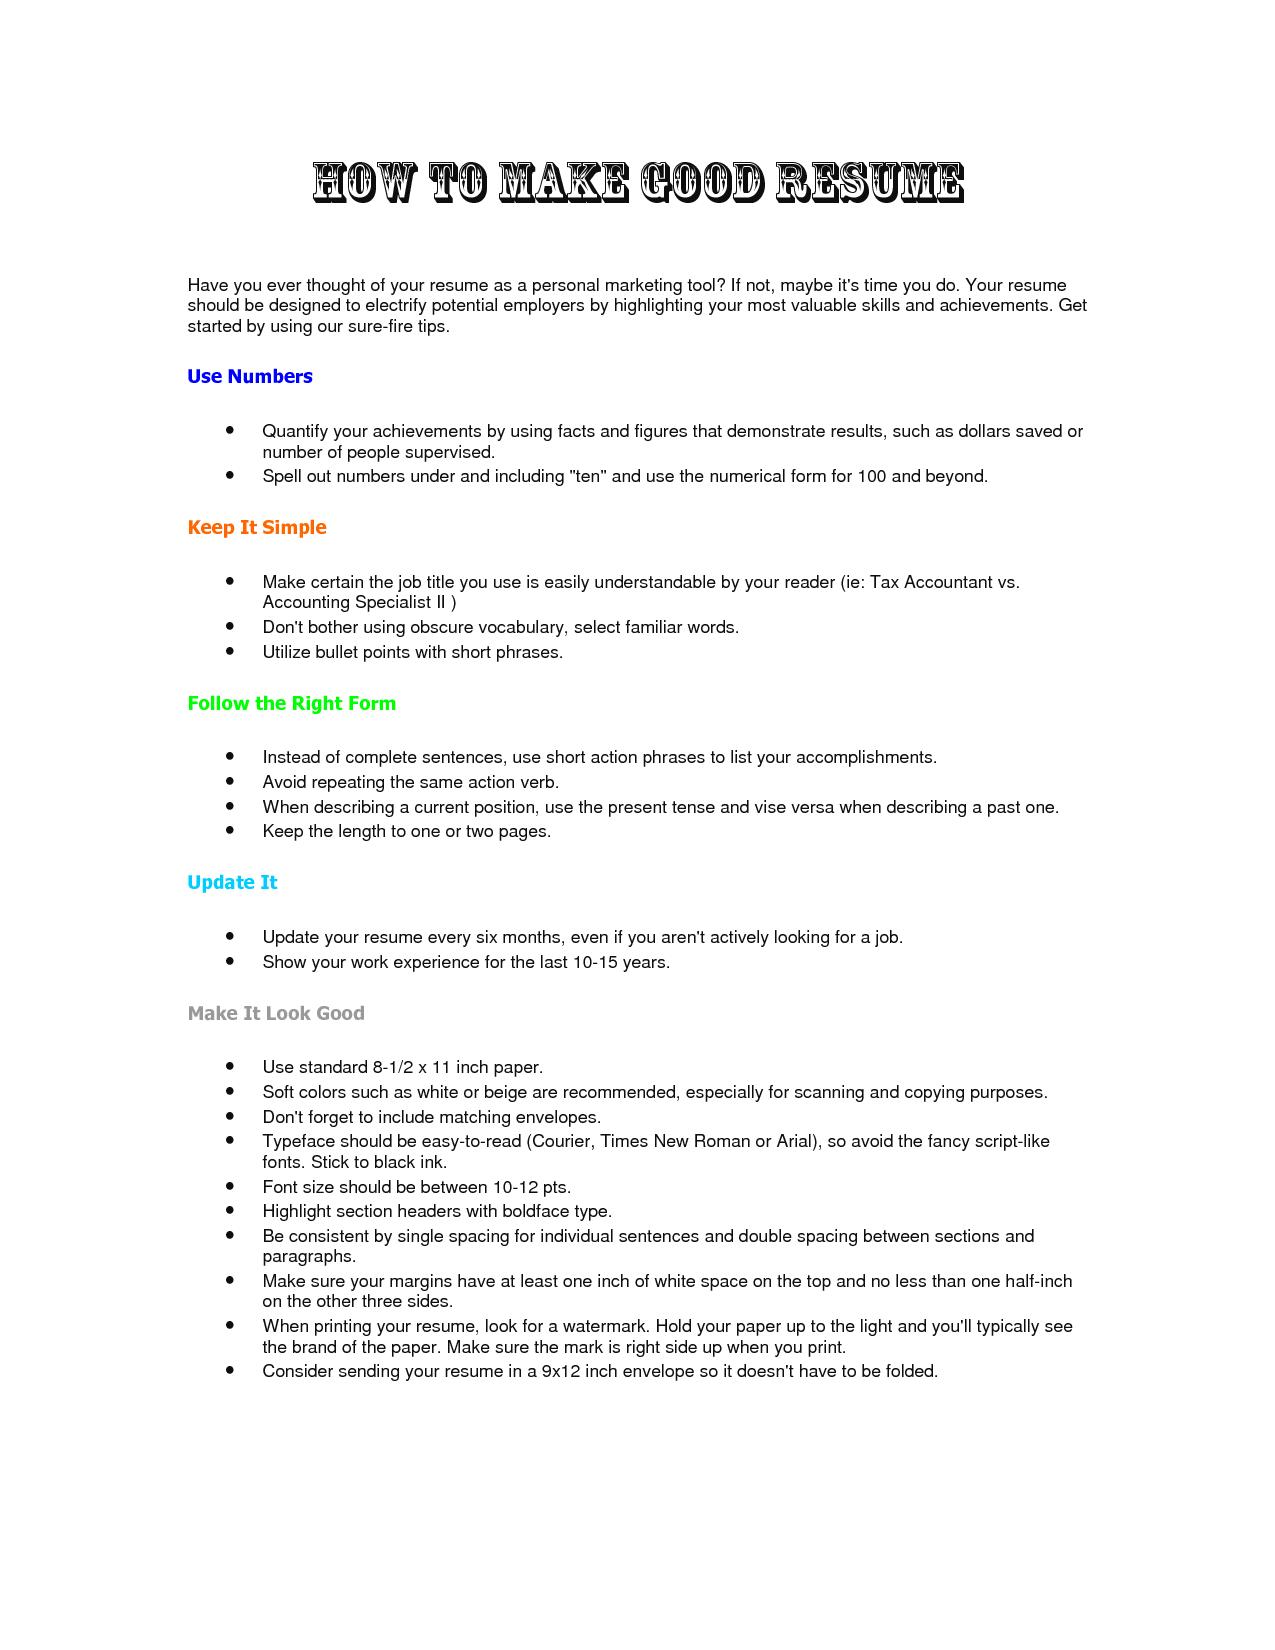 making good cv resume curriculum vitae making good cv resume cv resume and cover letter sample cv and resume resume seangarrettecohow